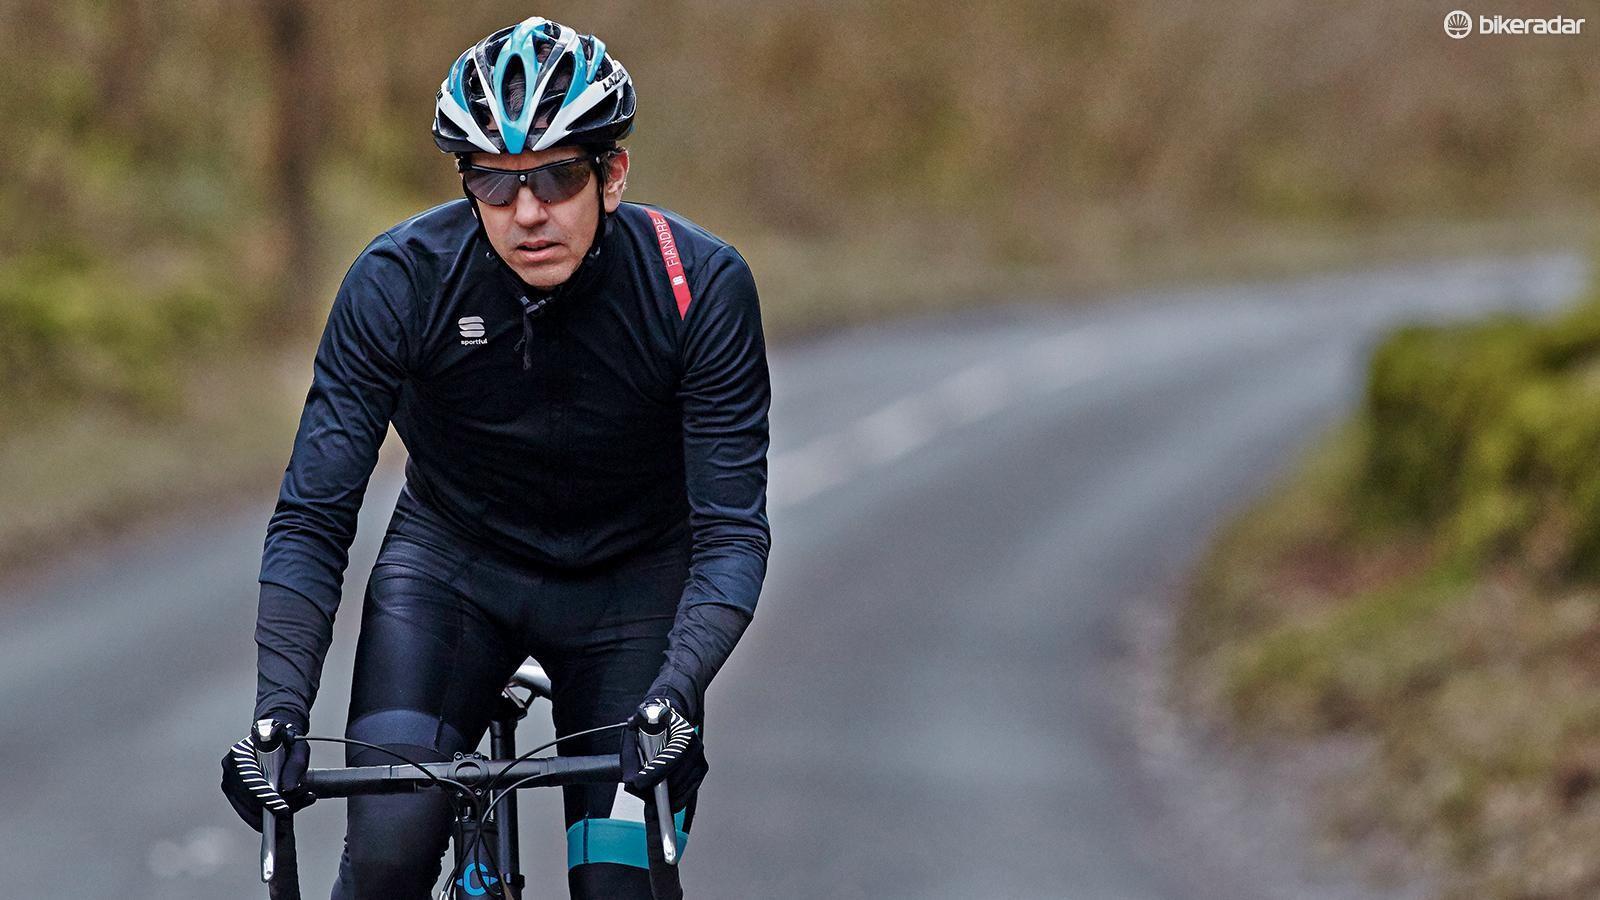 A serious cyclist